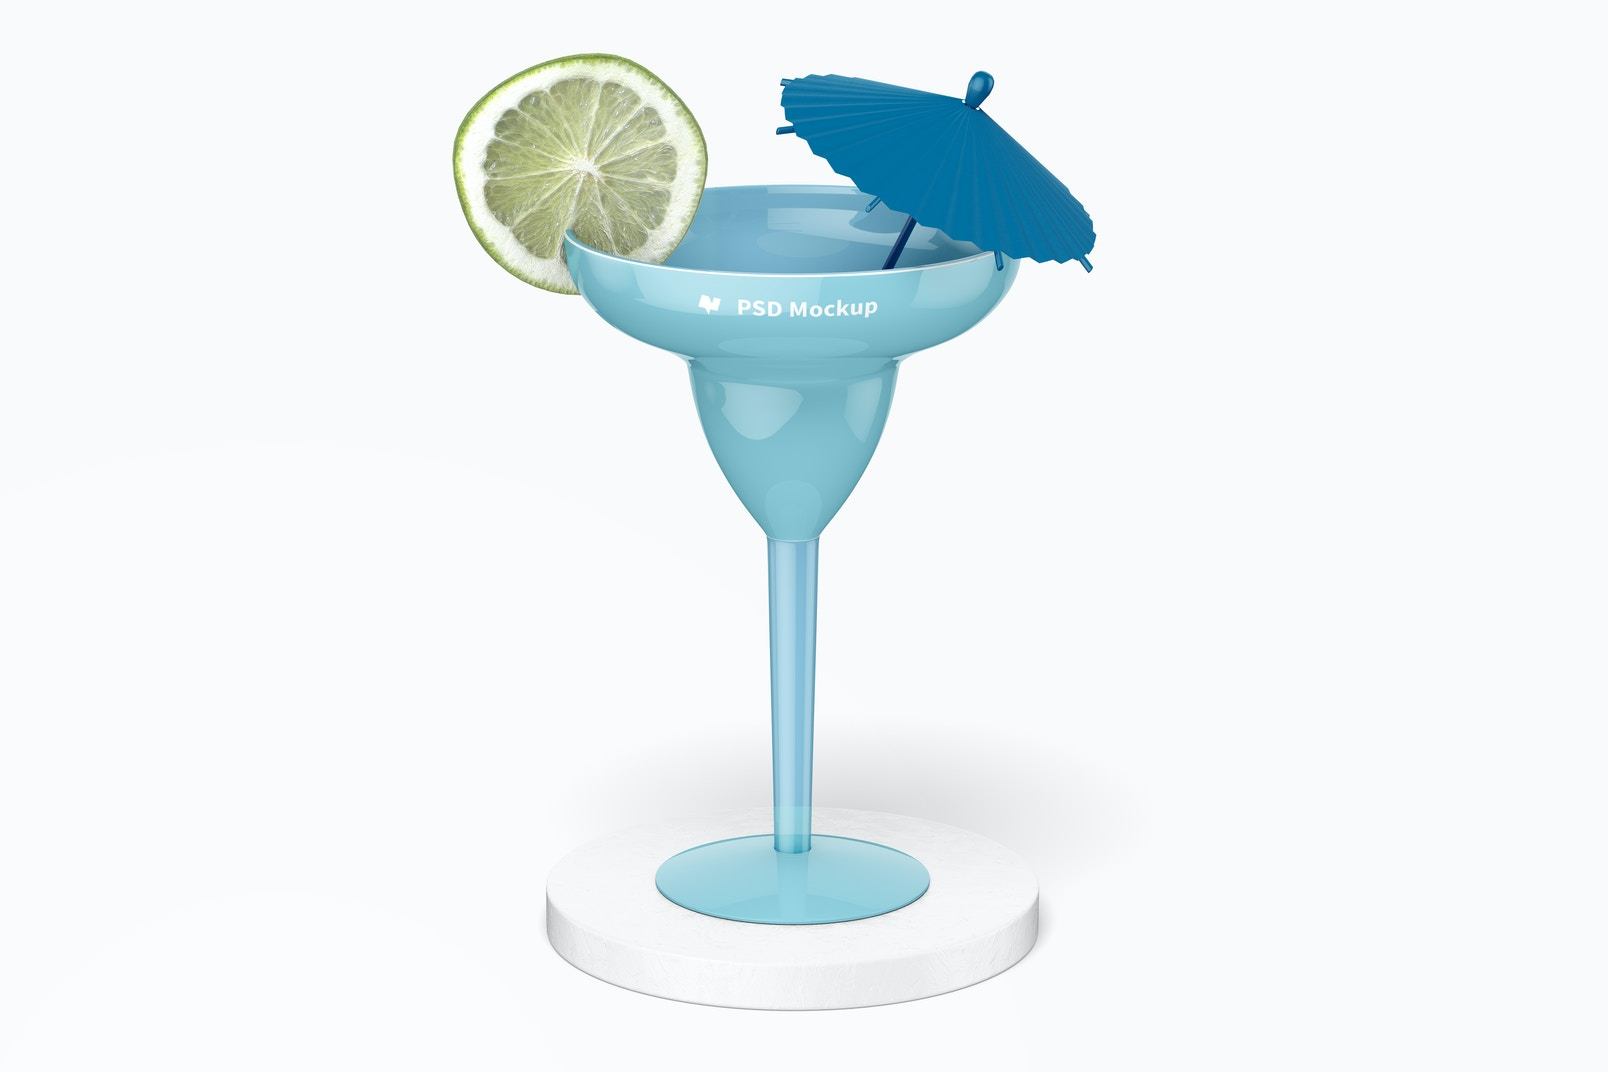 Plastic Margarita Glass Mockup, on Surface